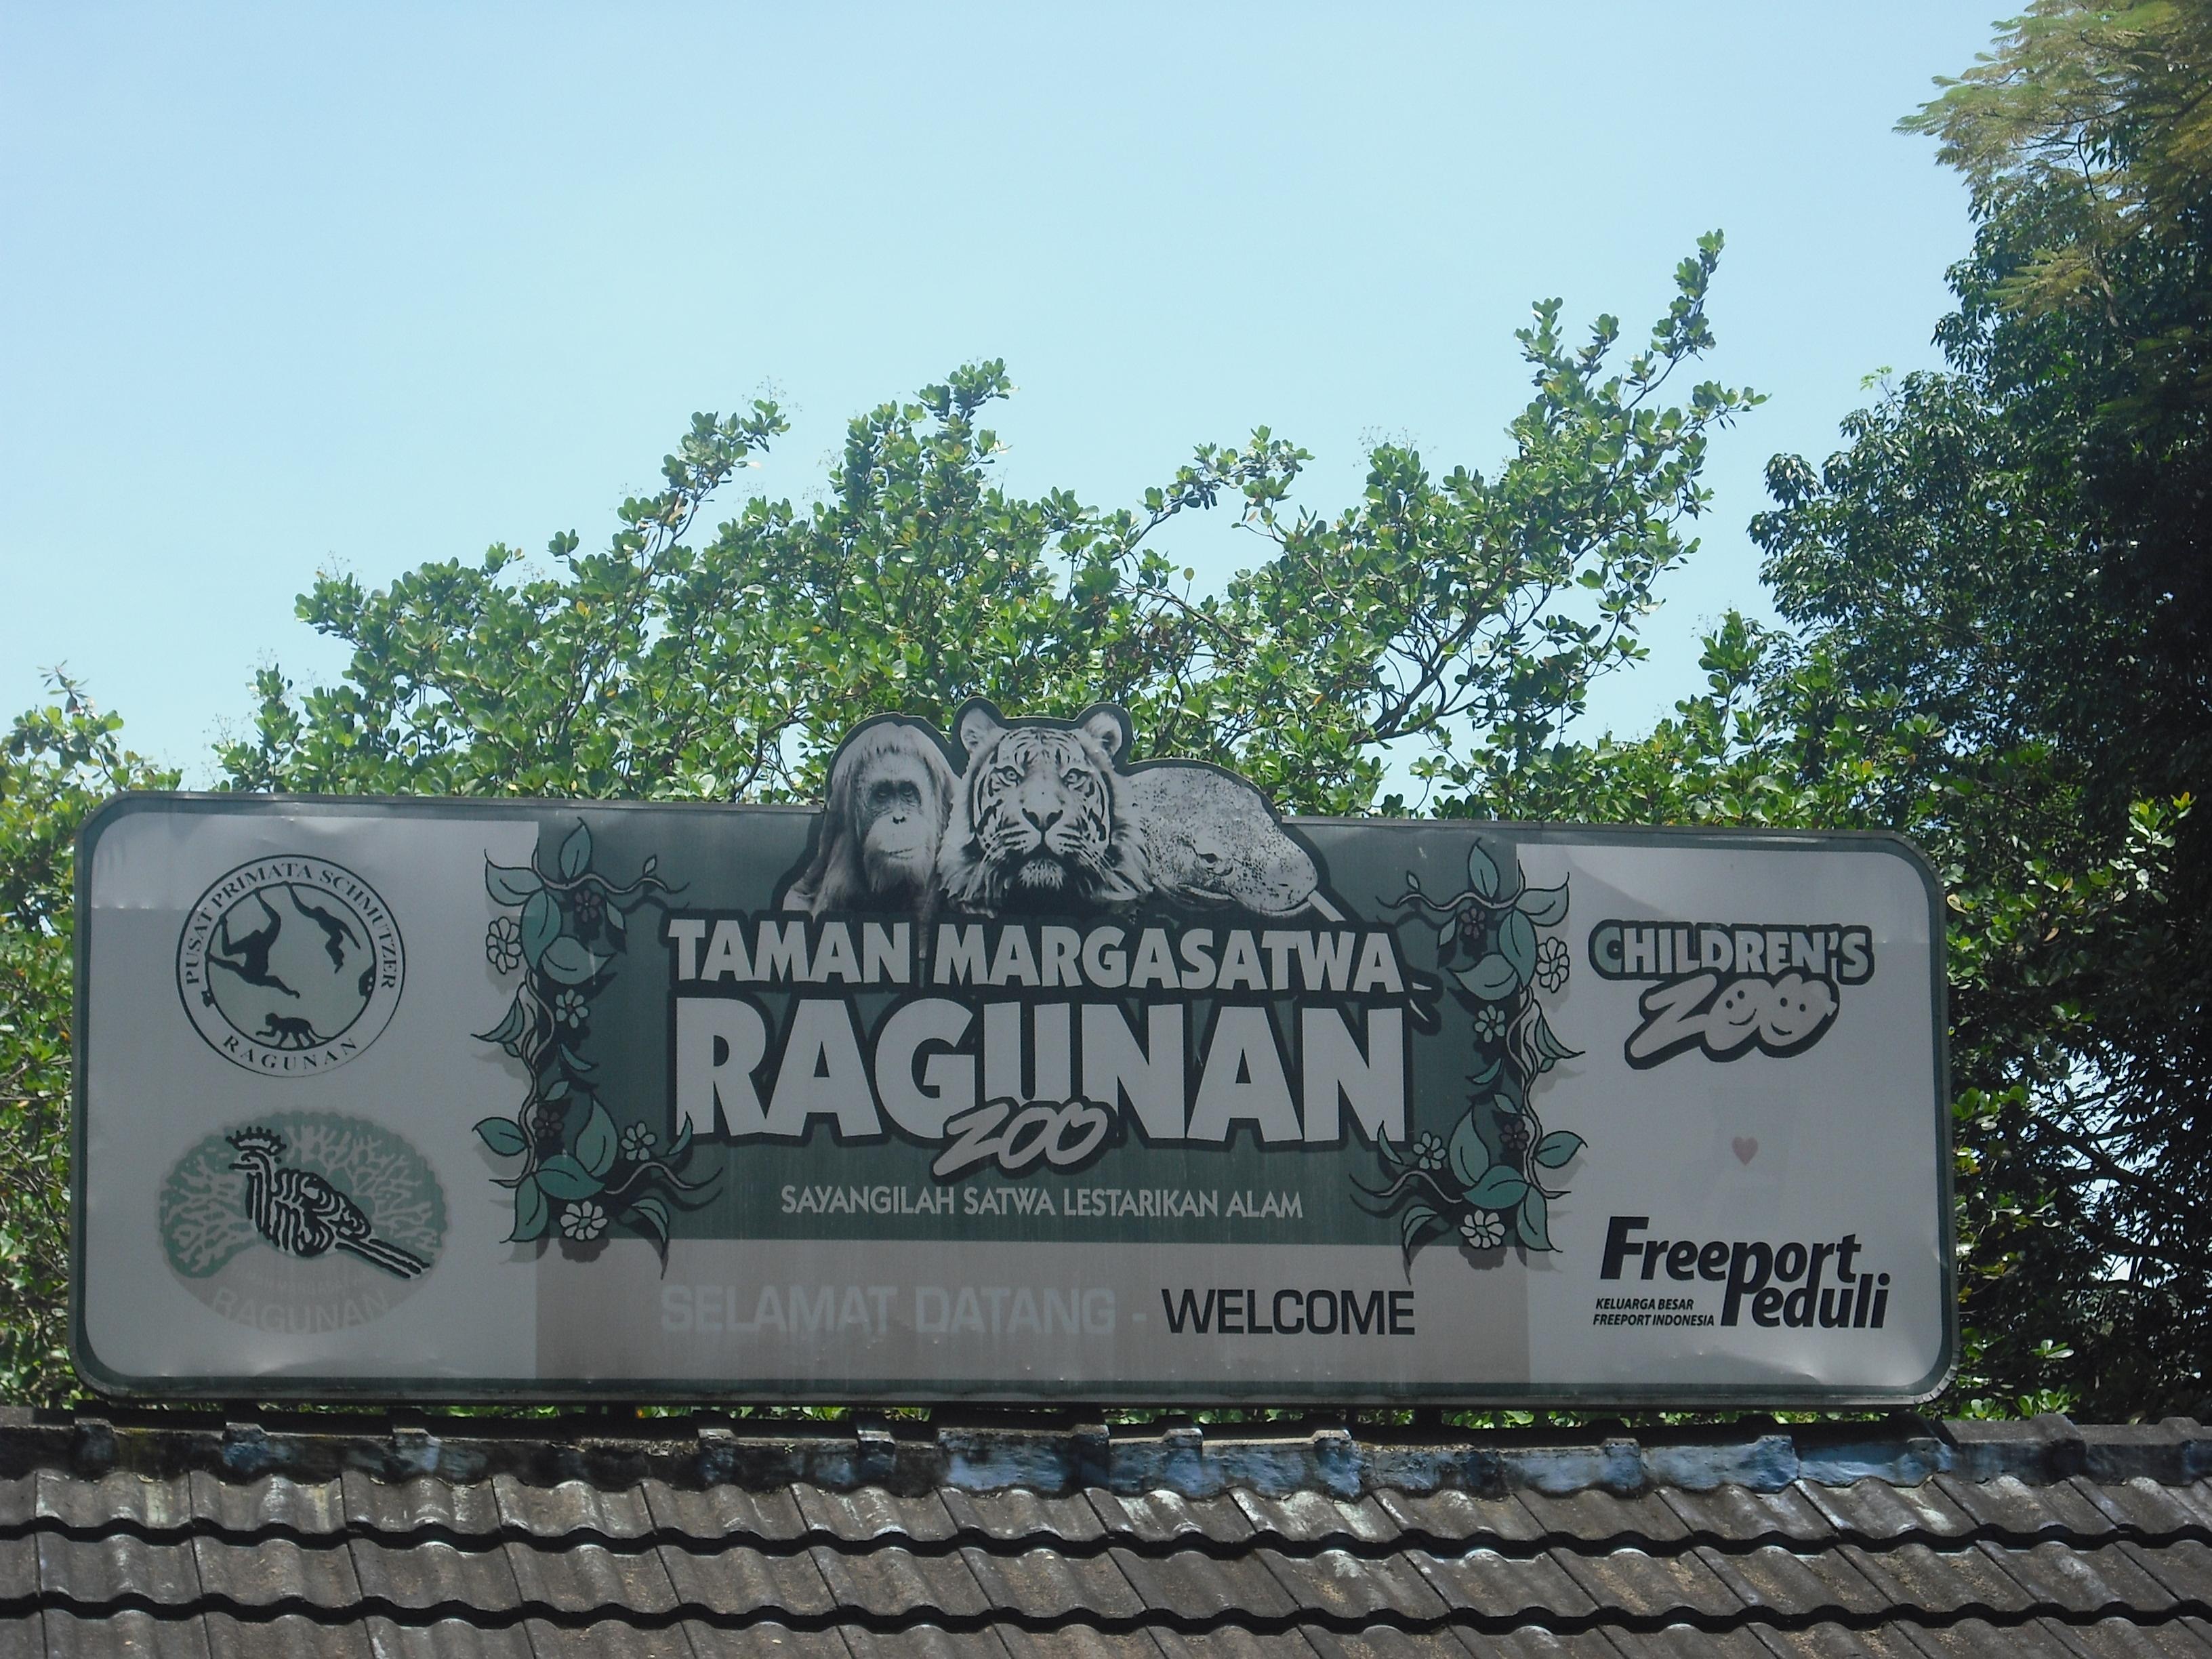 Kebun Binatang Ragunan Tour Indonesia Luas Sekitar 140 Hektar Dscf5323